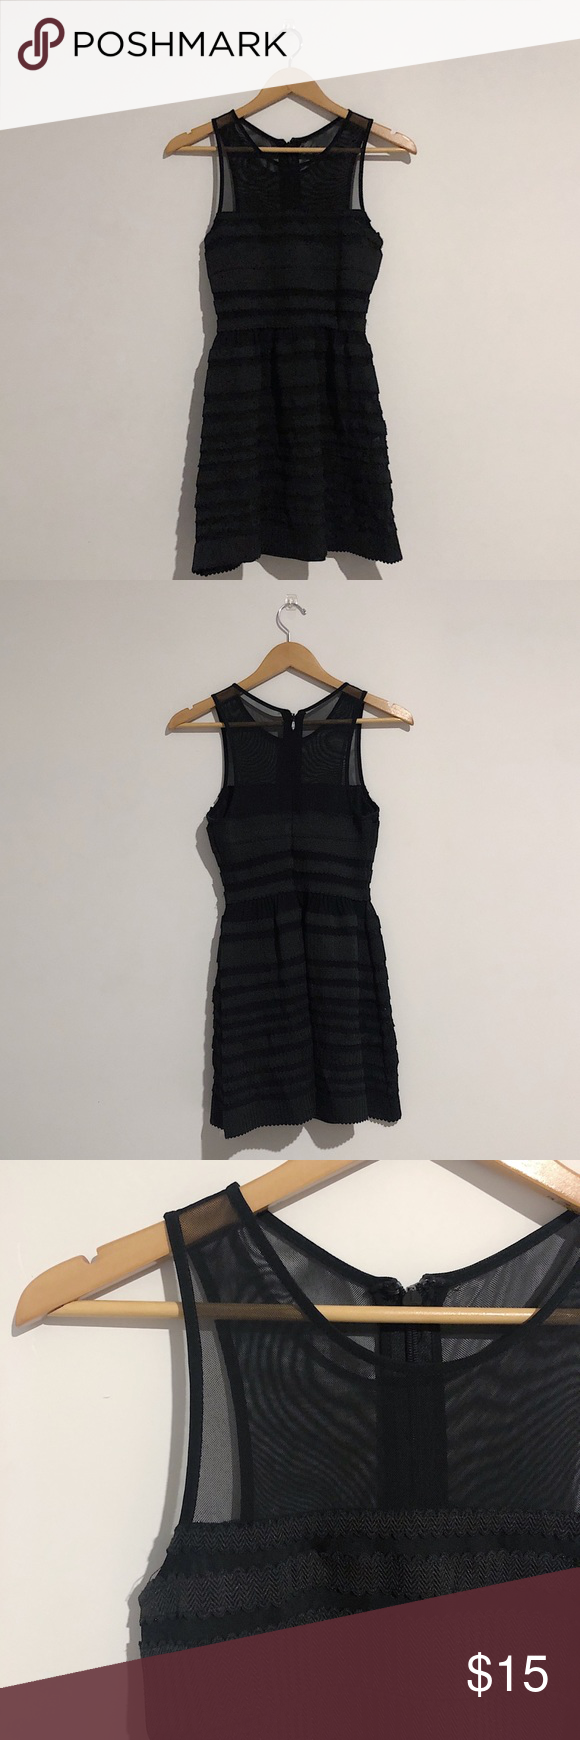 Black Elastic Dress In 2020 Clothes Design Wow Couture Dresses [ 1740 x 580 Pixel ]